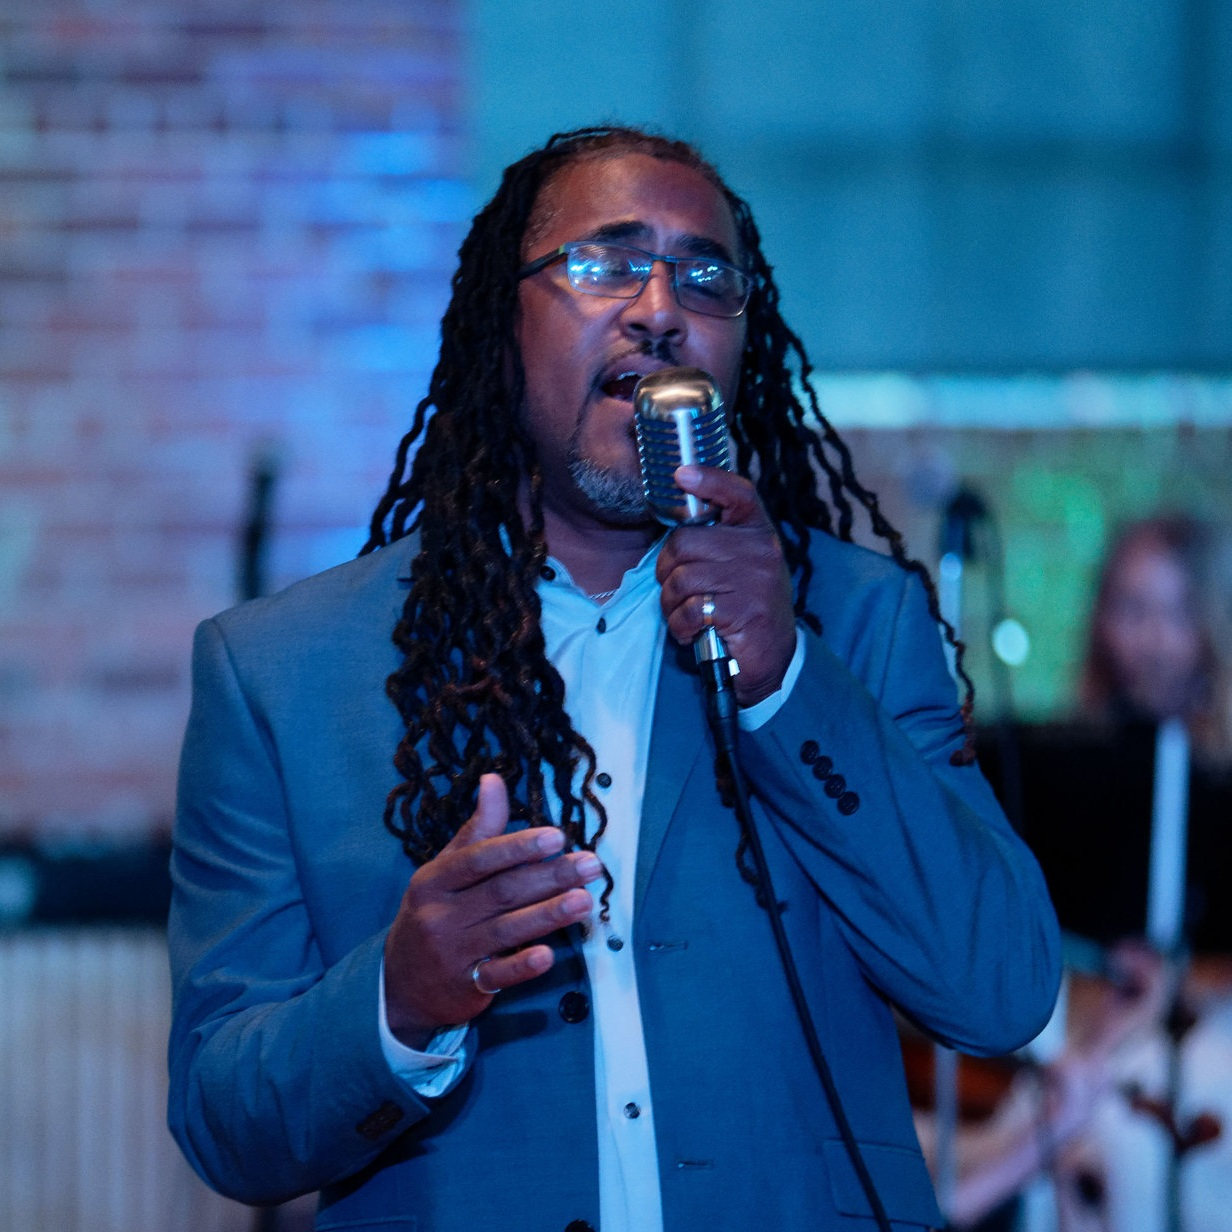 WALTER HEMINGWAY, vocal